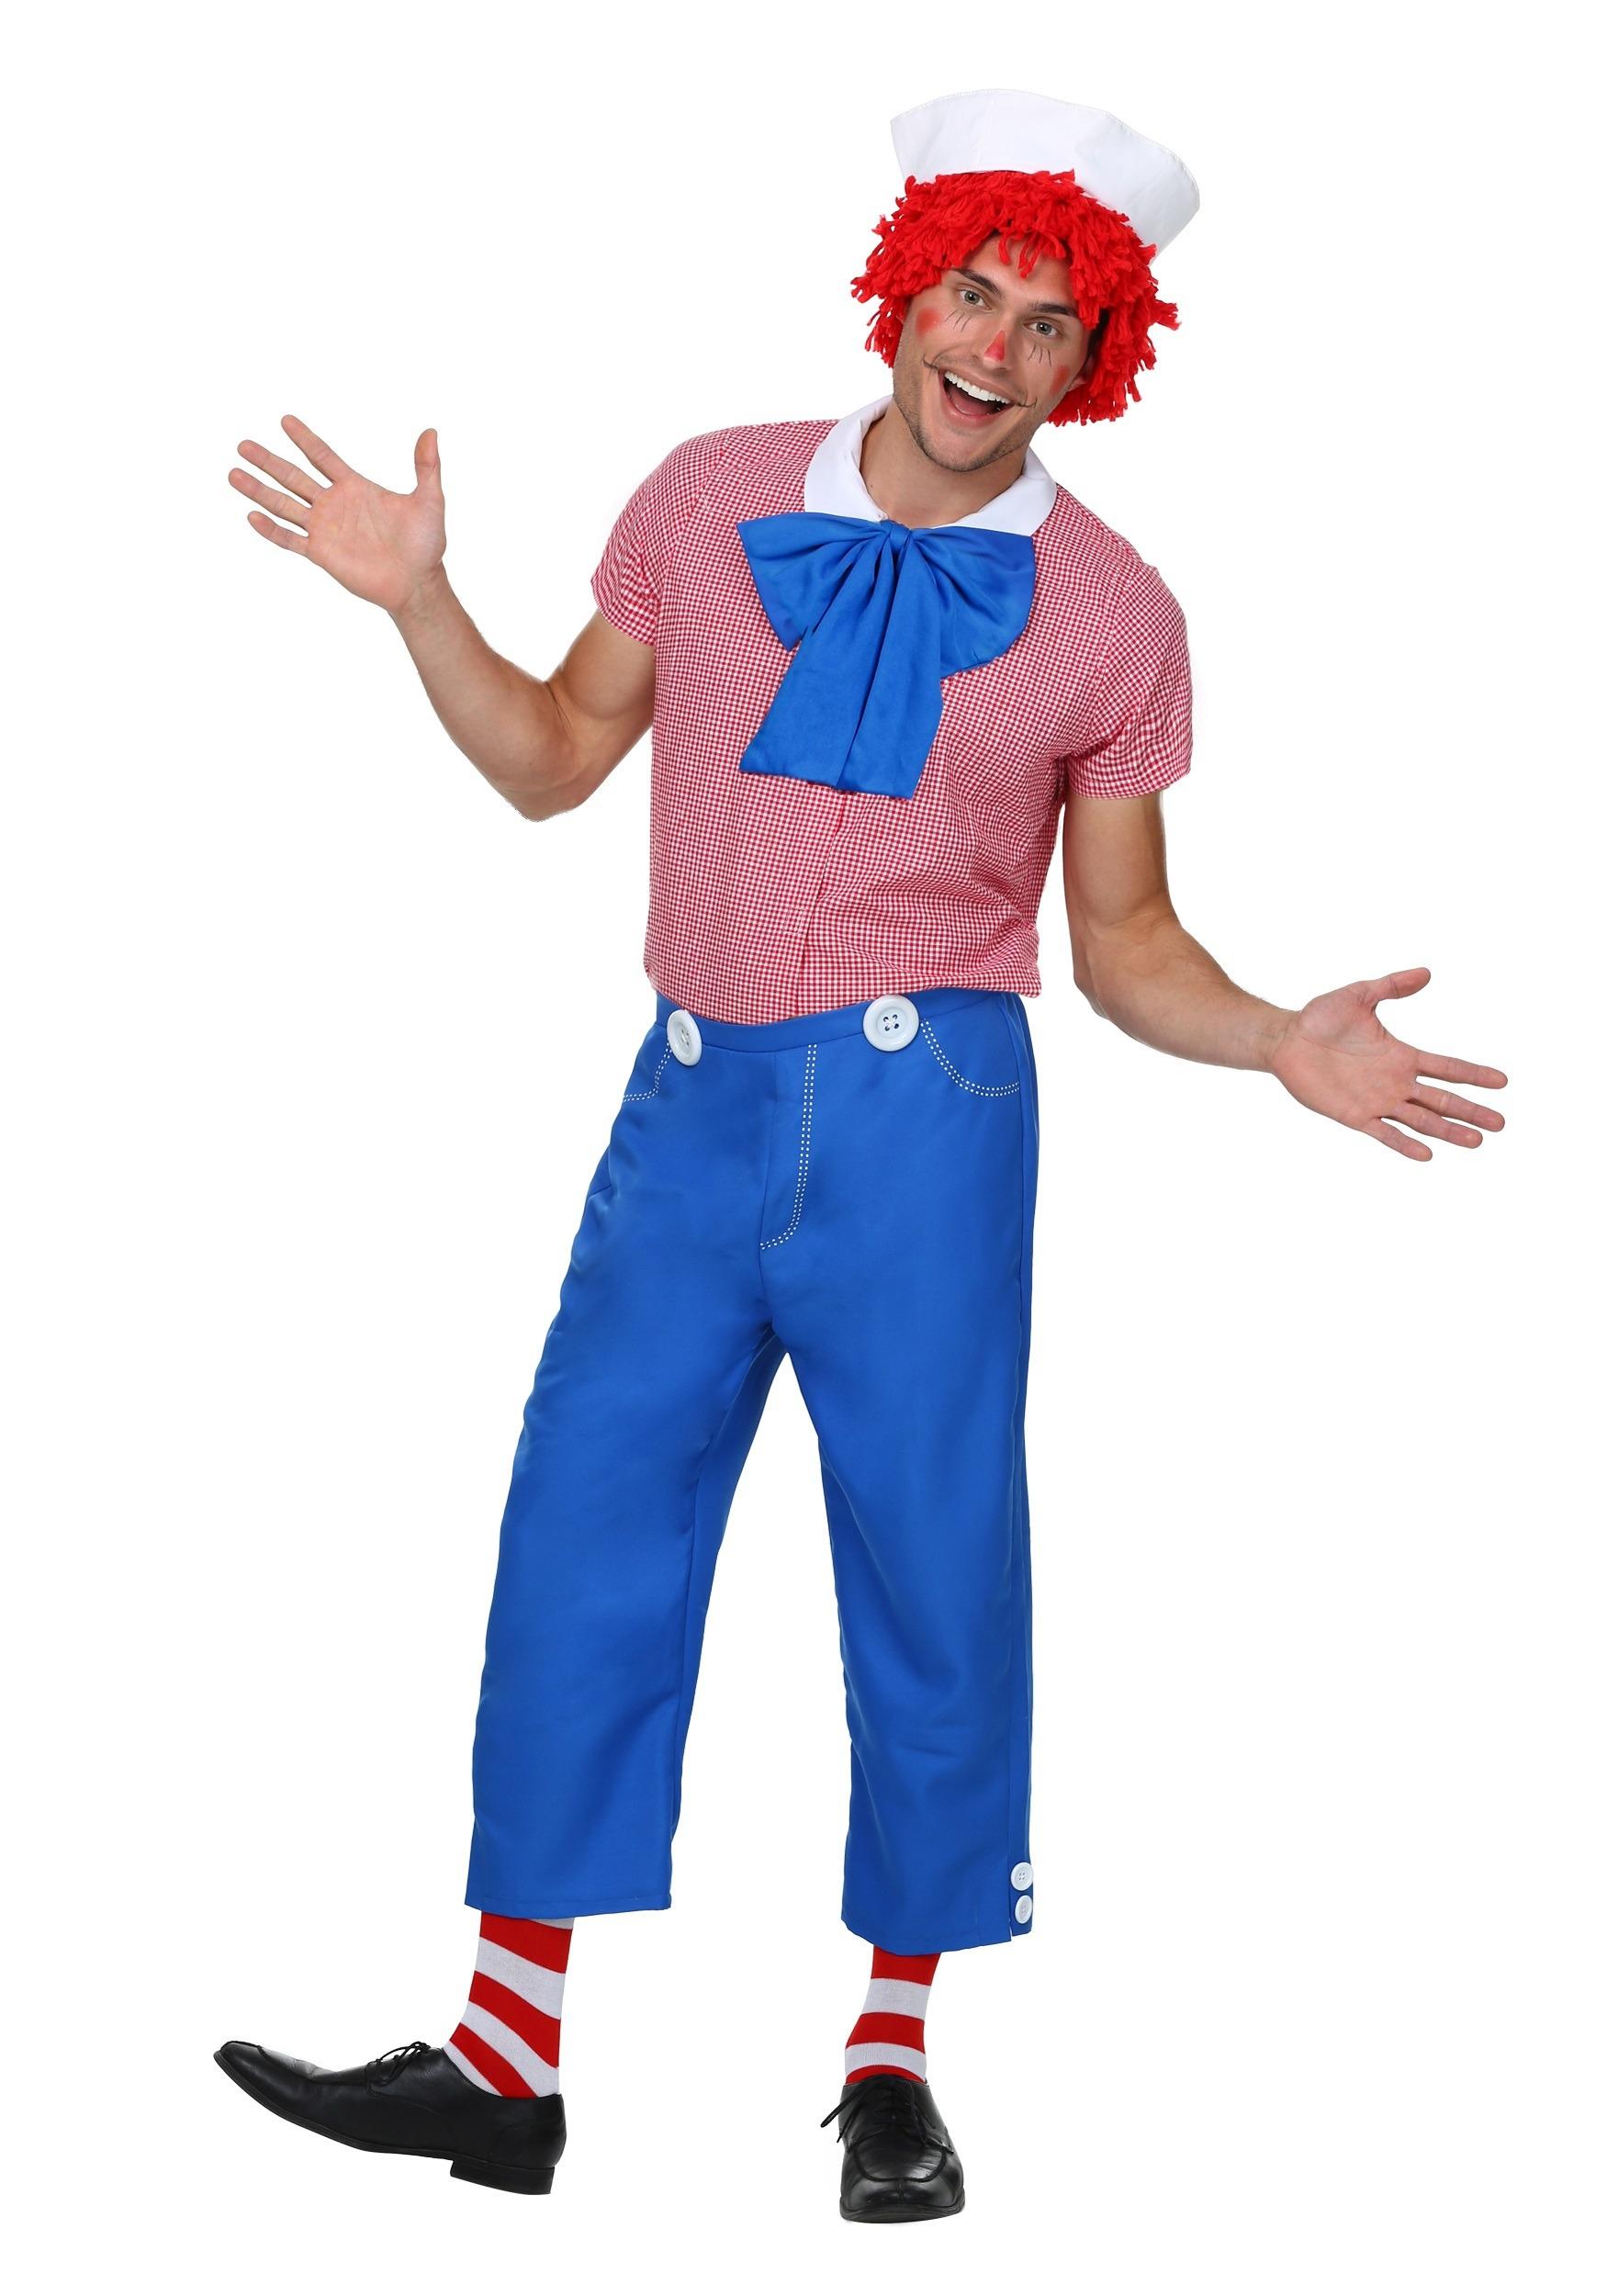 Adult Men's Rag Doll Costume